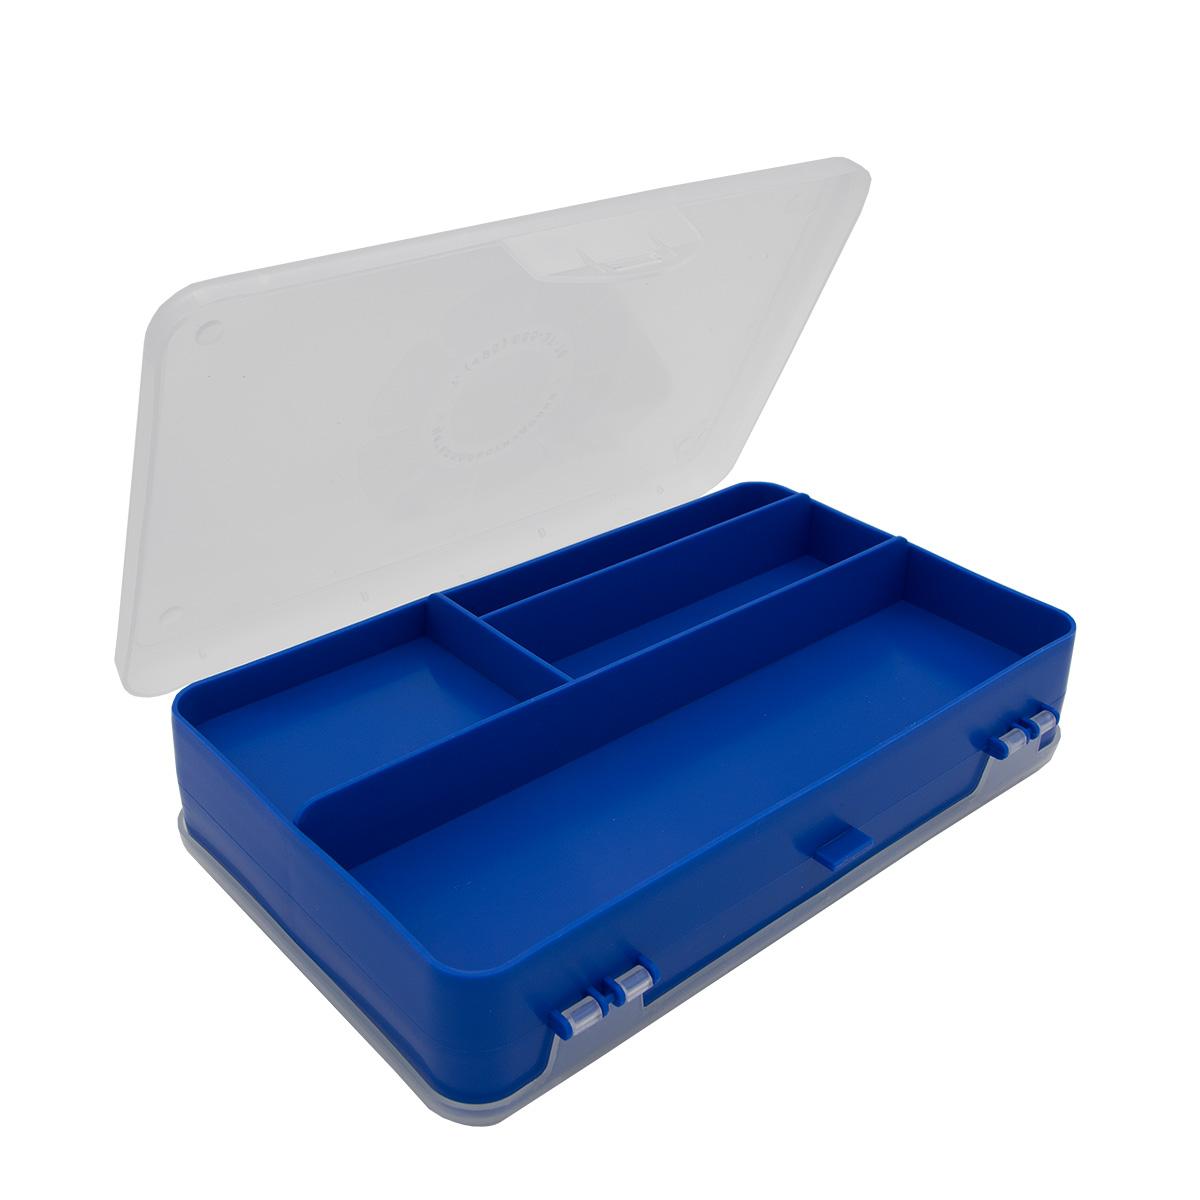 С-219 Коробка(шкатулка) для мелочей, 21,5*12,5*5 см